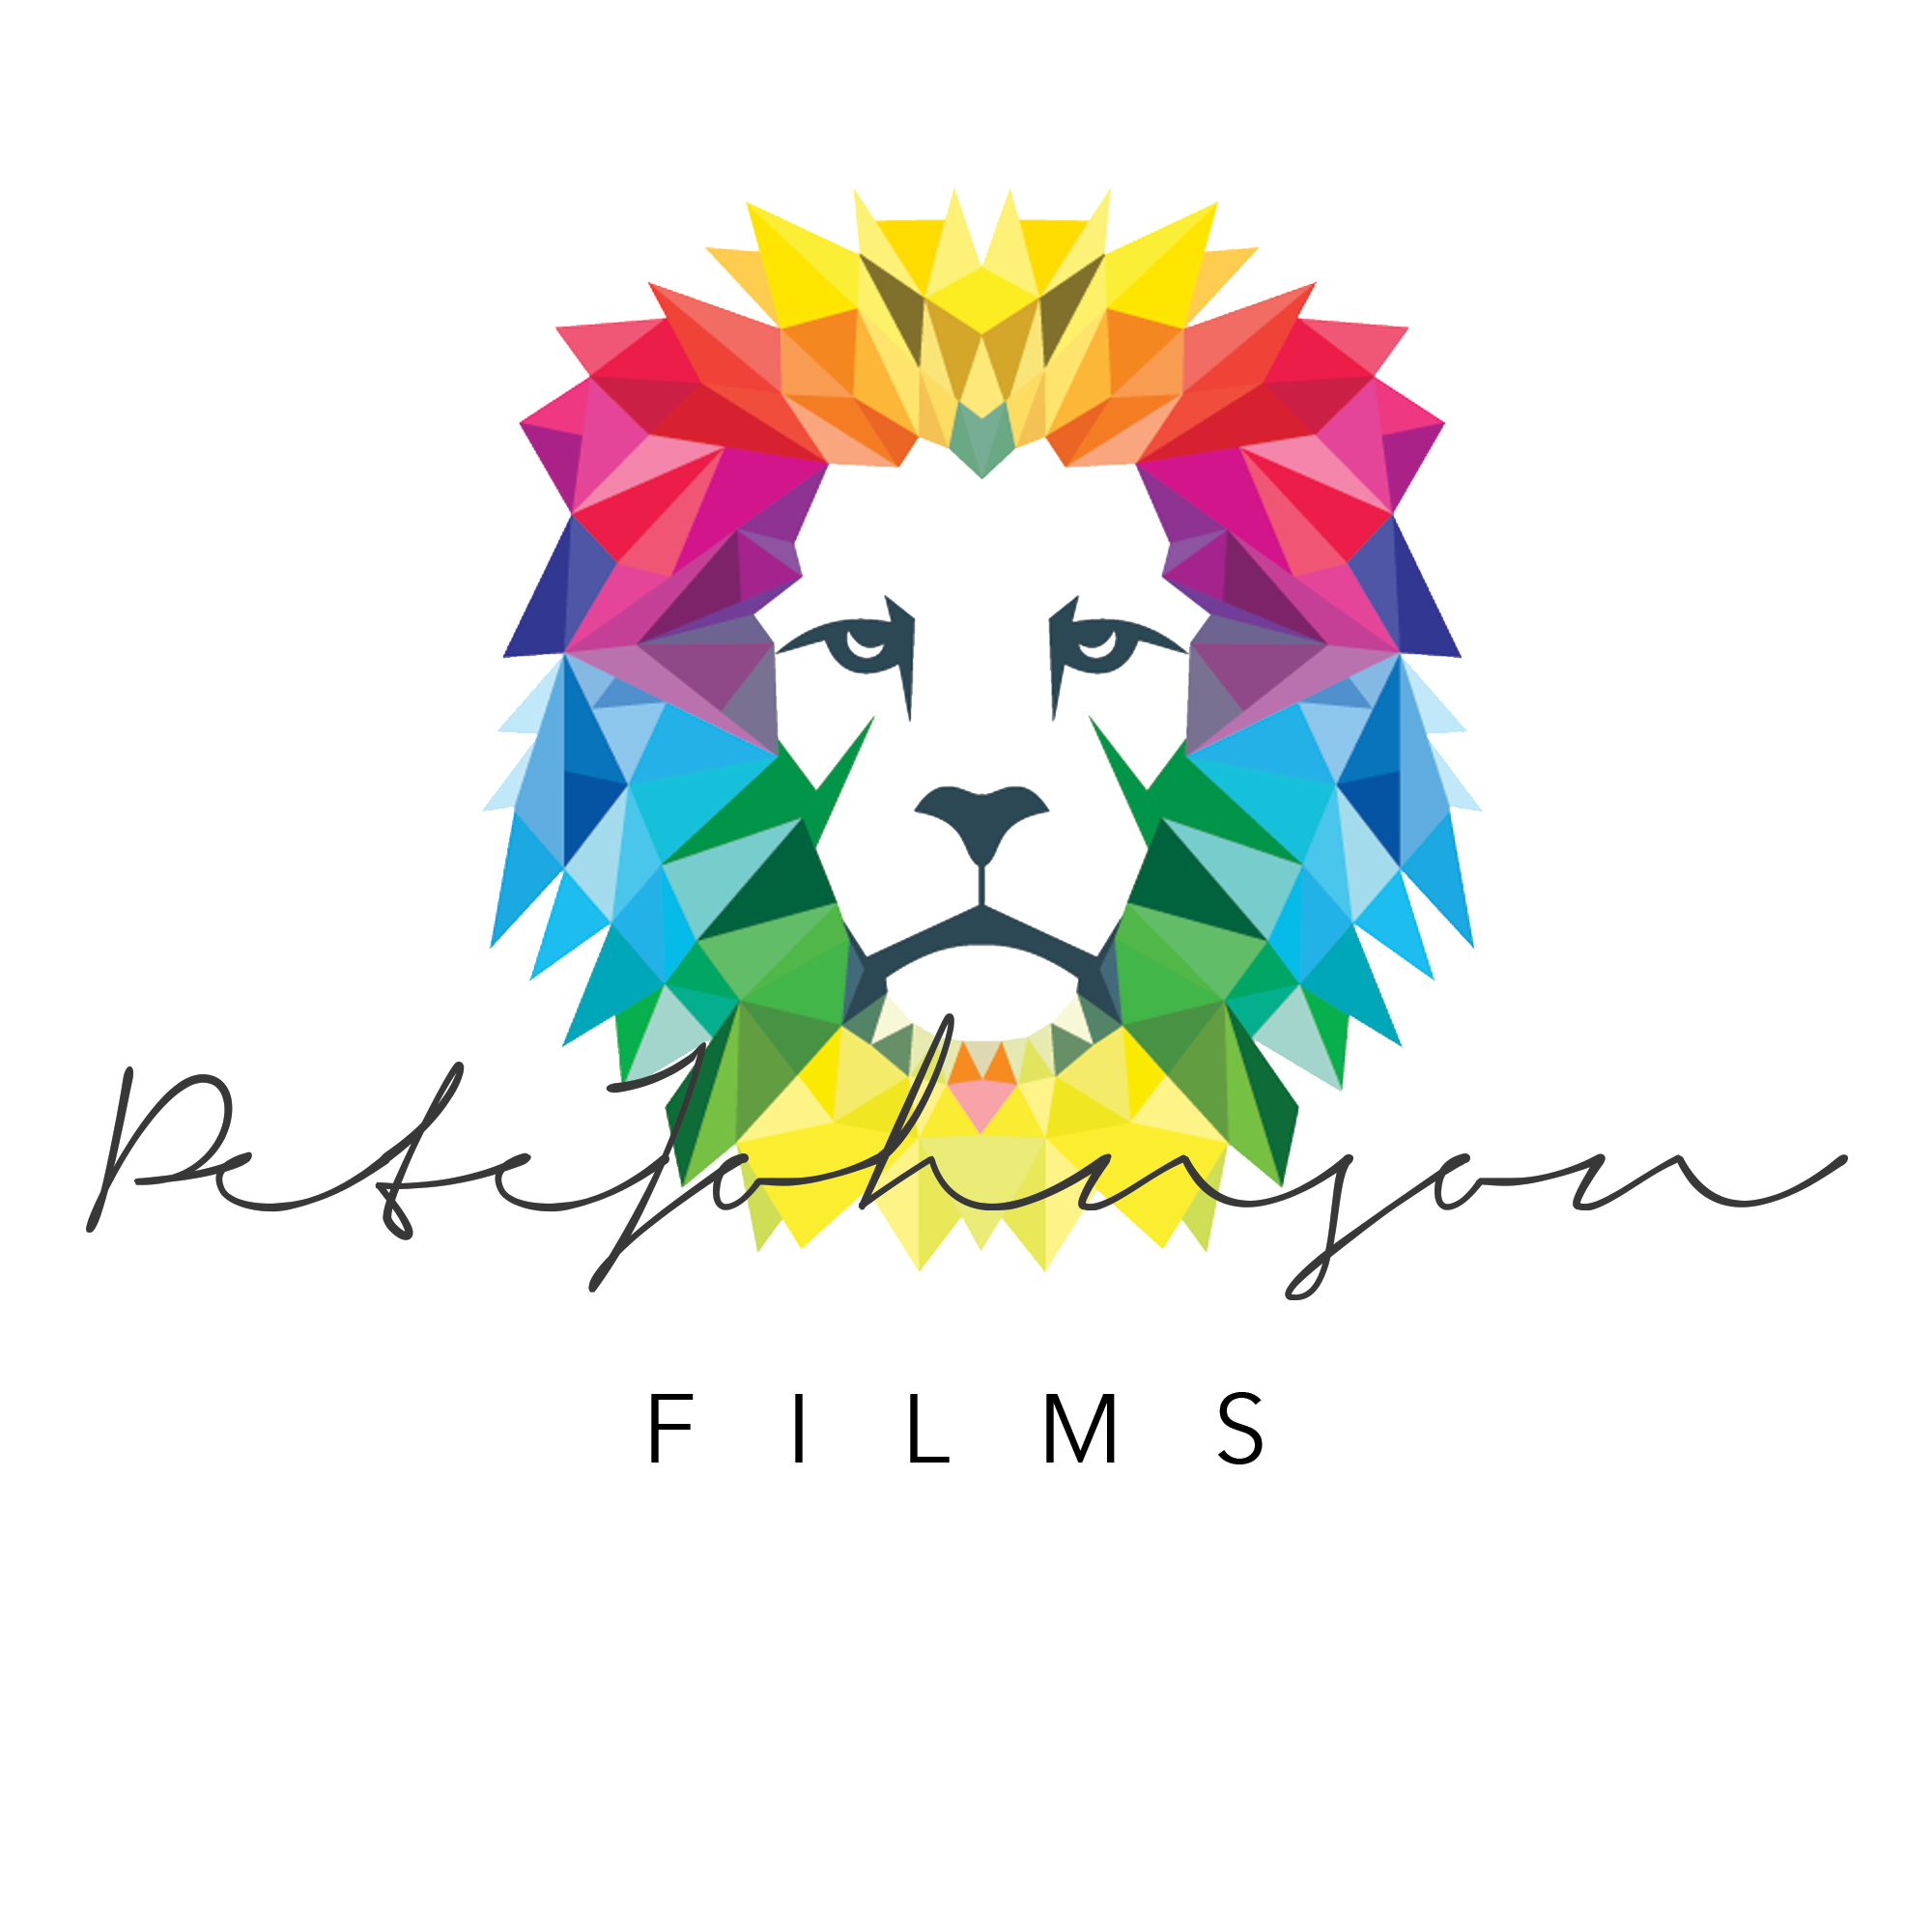 Pete Johnson Films